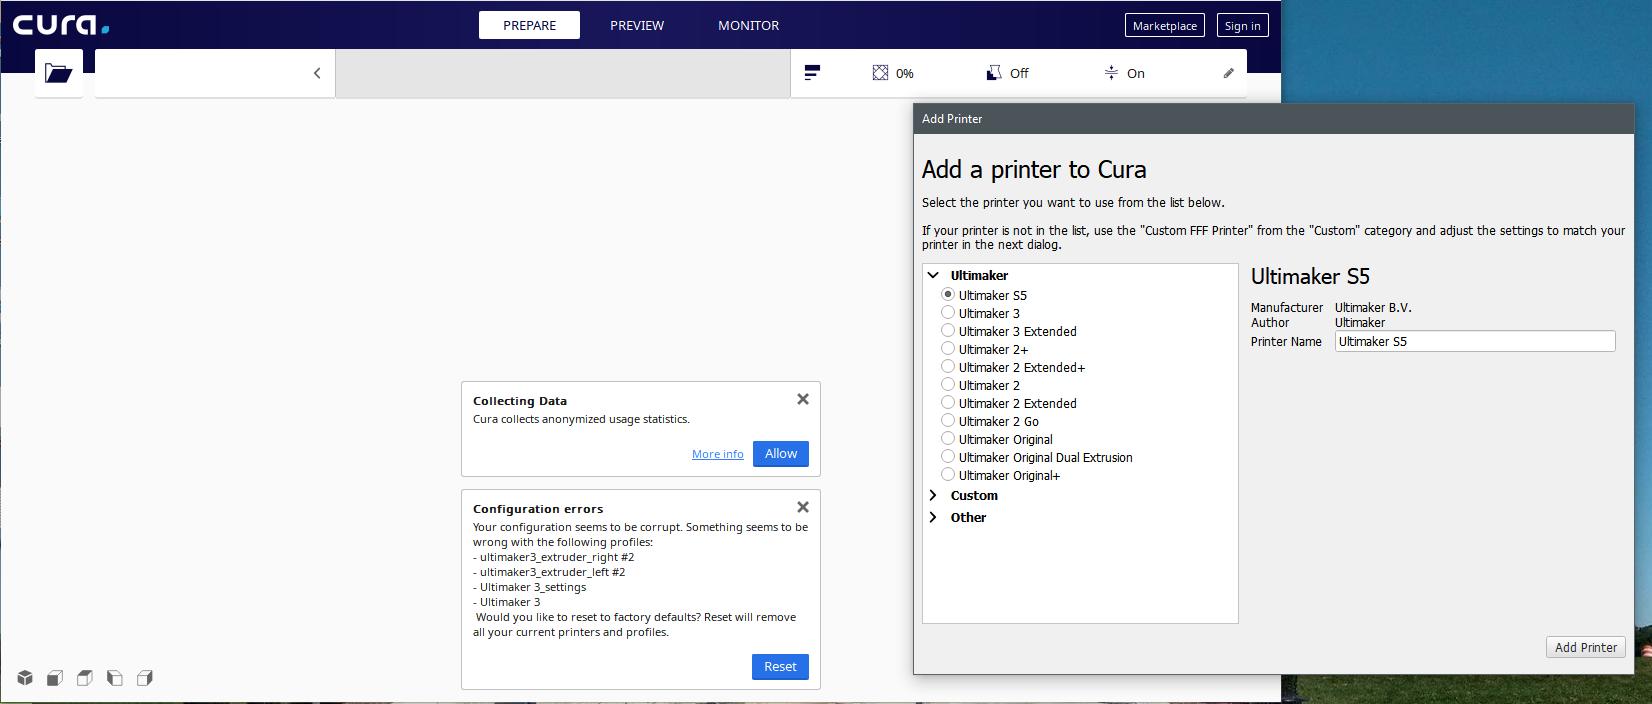 🌈 Cura 3 5 ender 3 profile | Ender 3 DIY 3D Printer Kit  2019-06-05